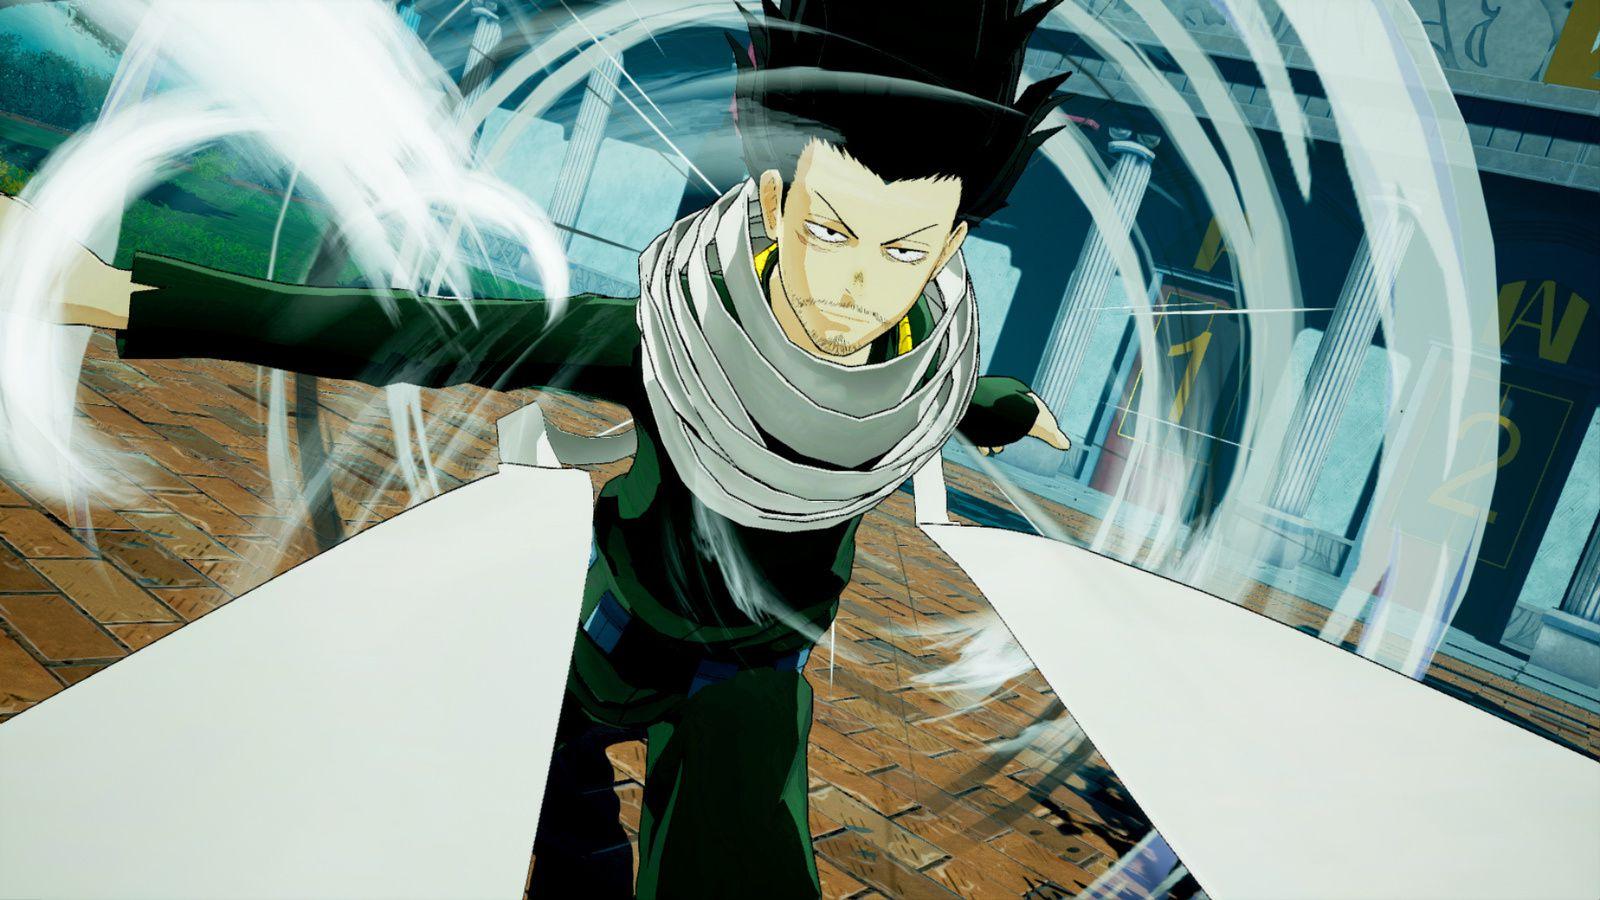 Stain et Shota Aizawa rejoindront le casting de MY HERO Game Project